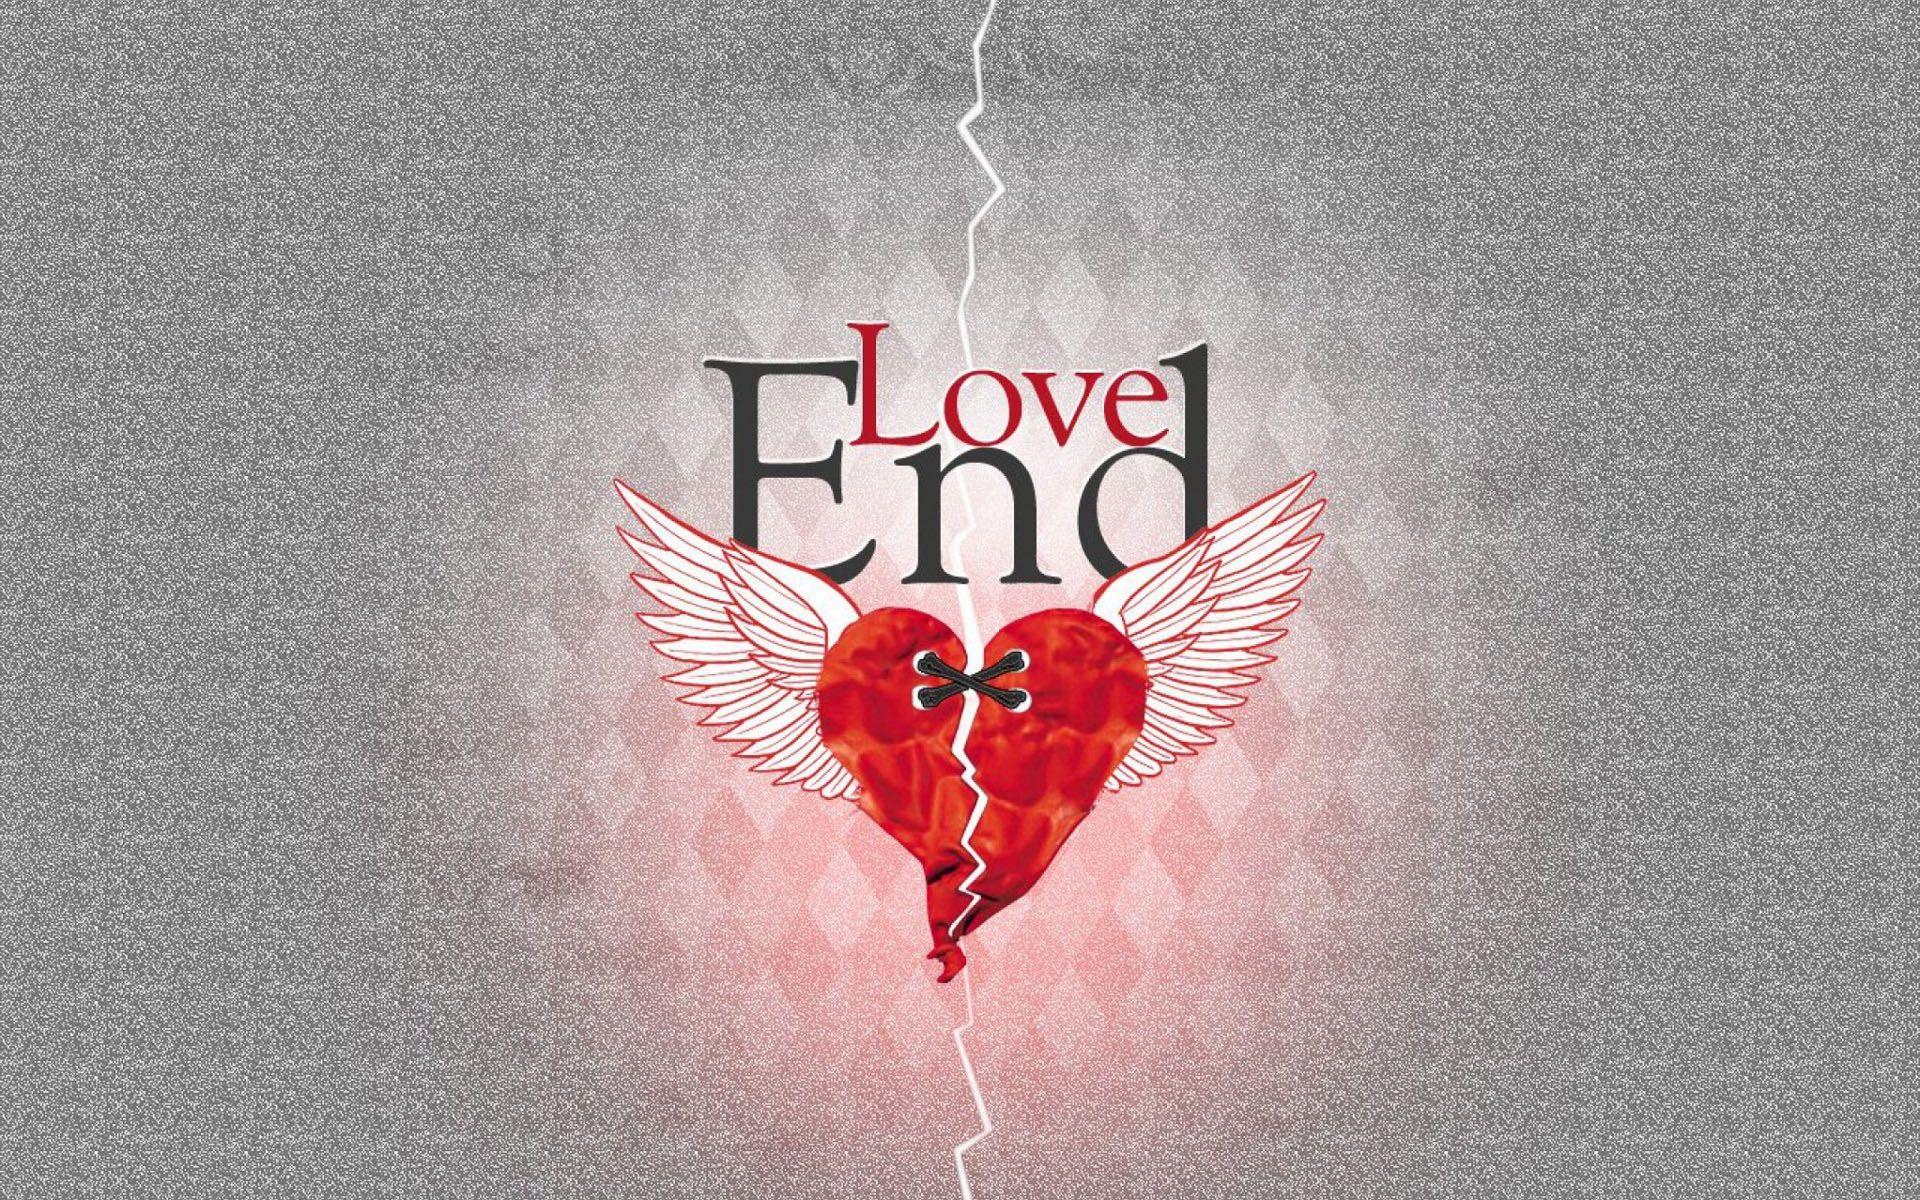 Free Download Images Of Love Break Download Love Break Up Free Download Wide Hd Wallpapers Wallpapers Wi Love Breakup Broken Heart Wallpaper Love Wallpaper